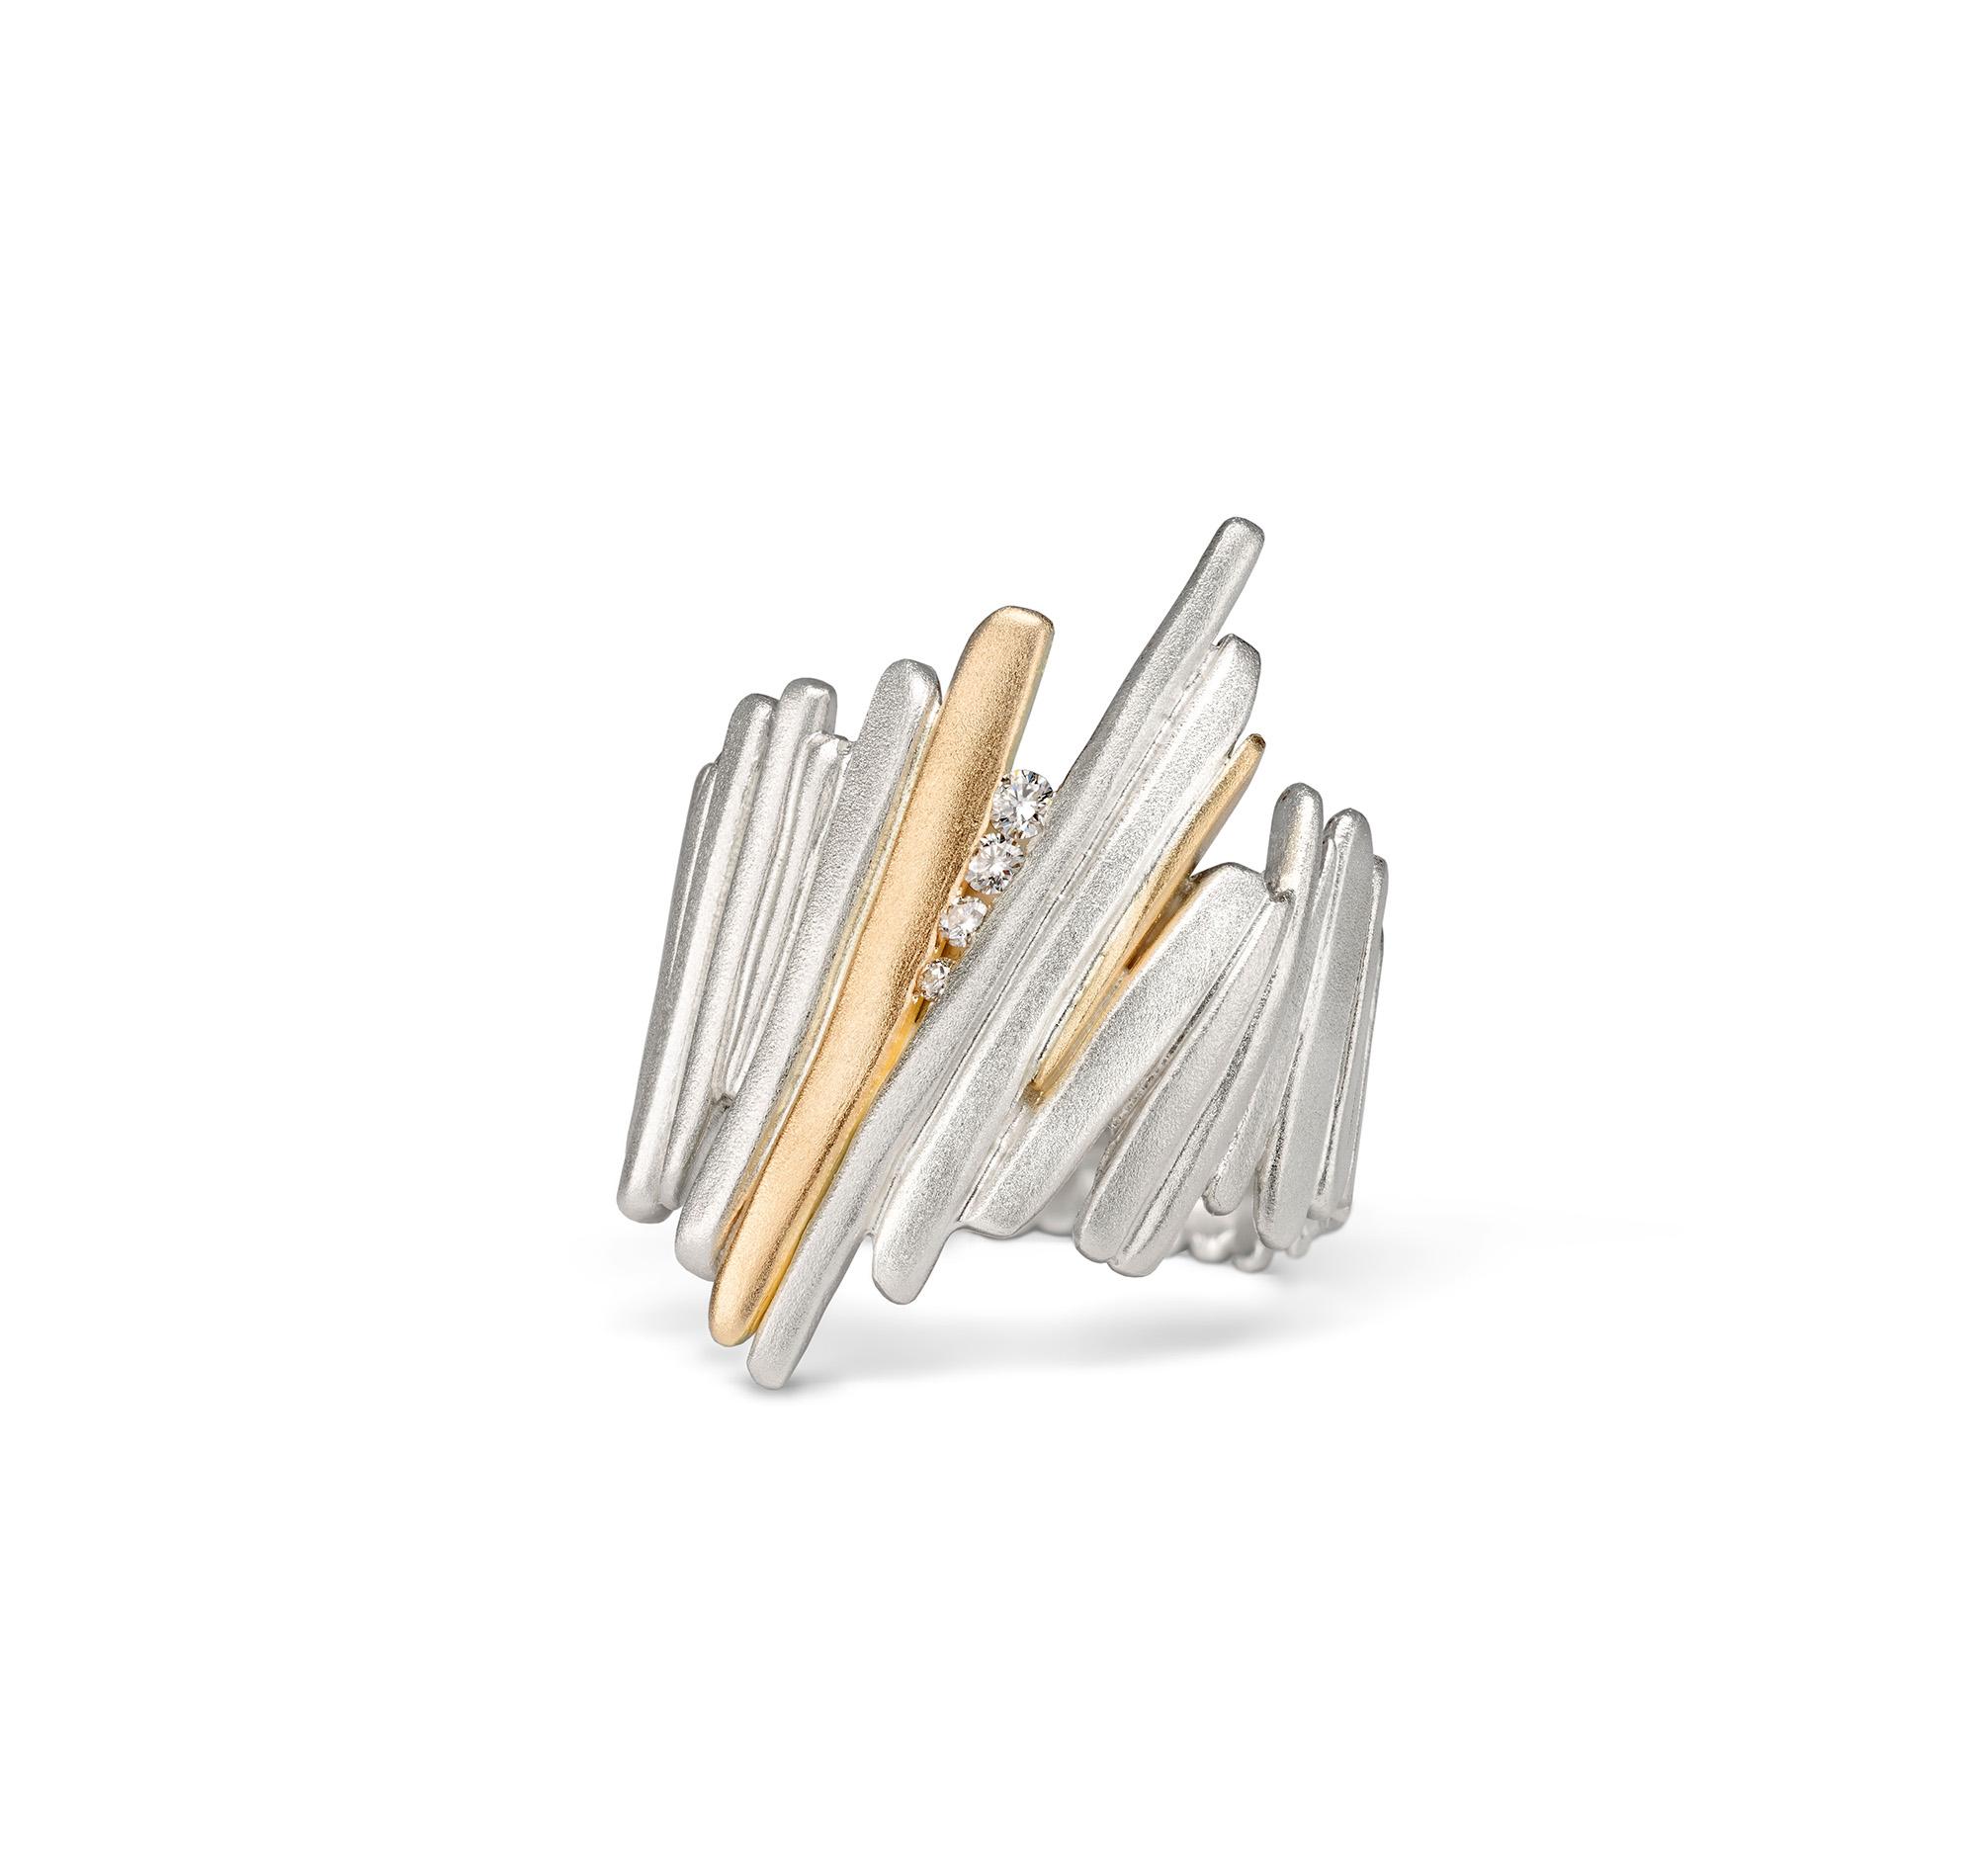 mirri-damer-wide-drift-ring-silver-diamonds.jpg